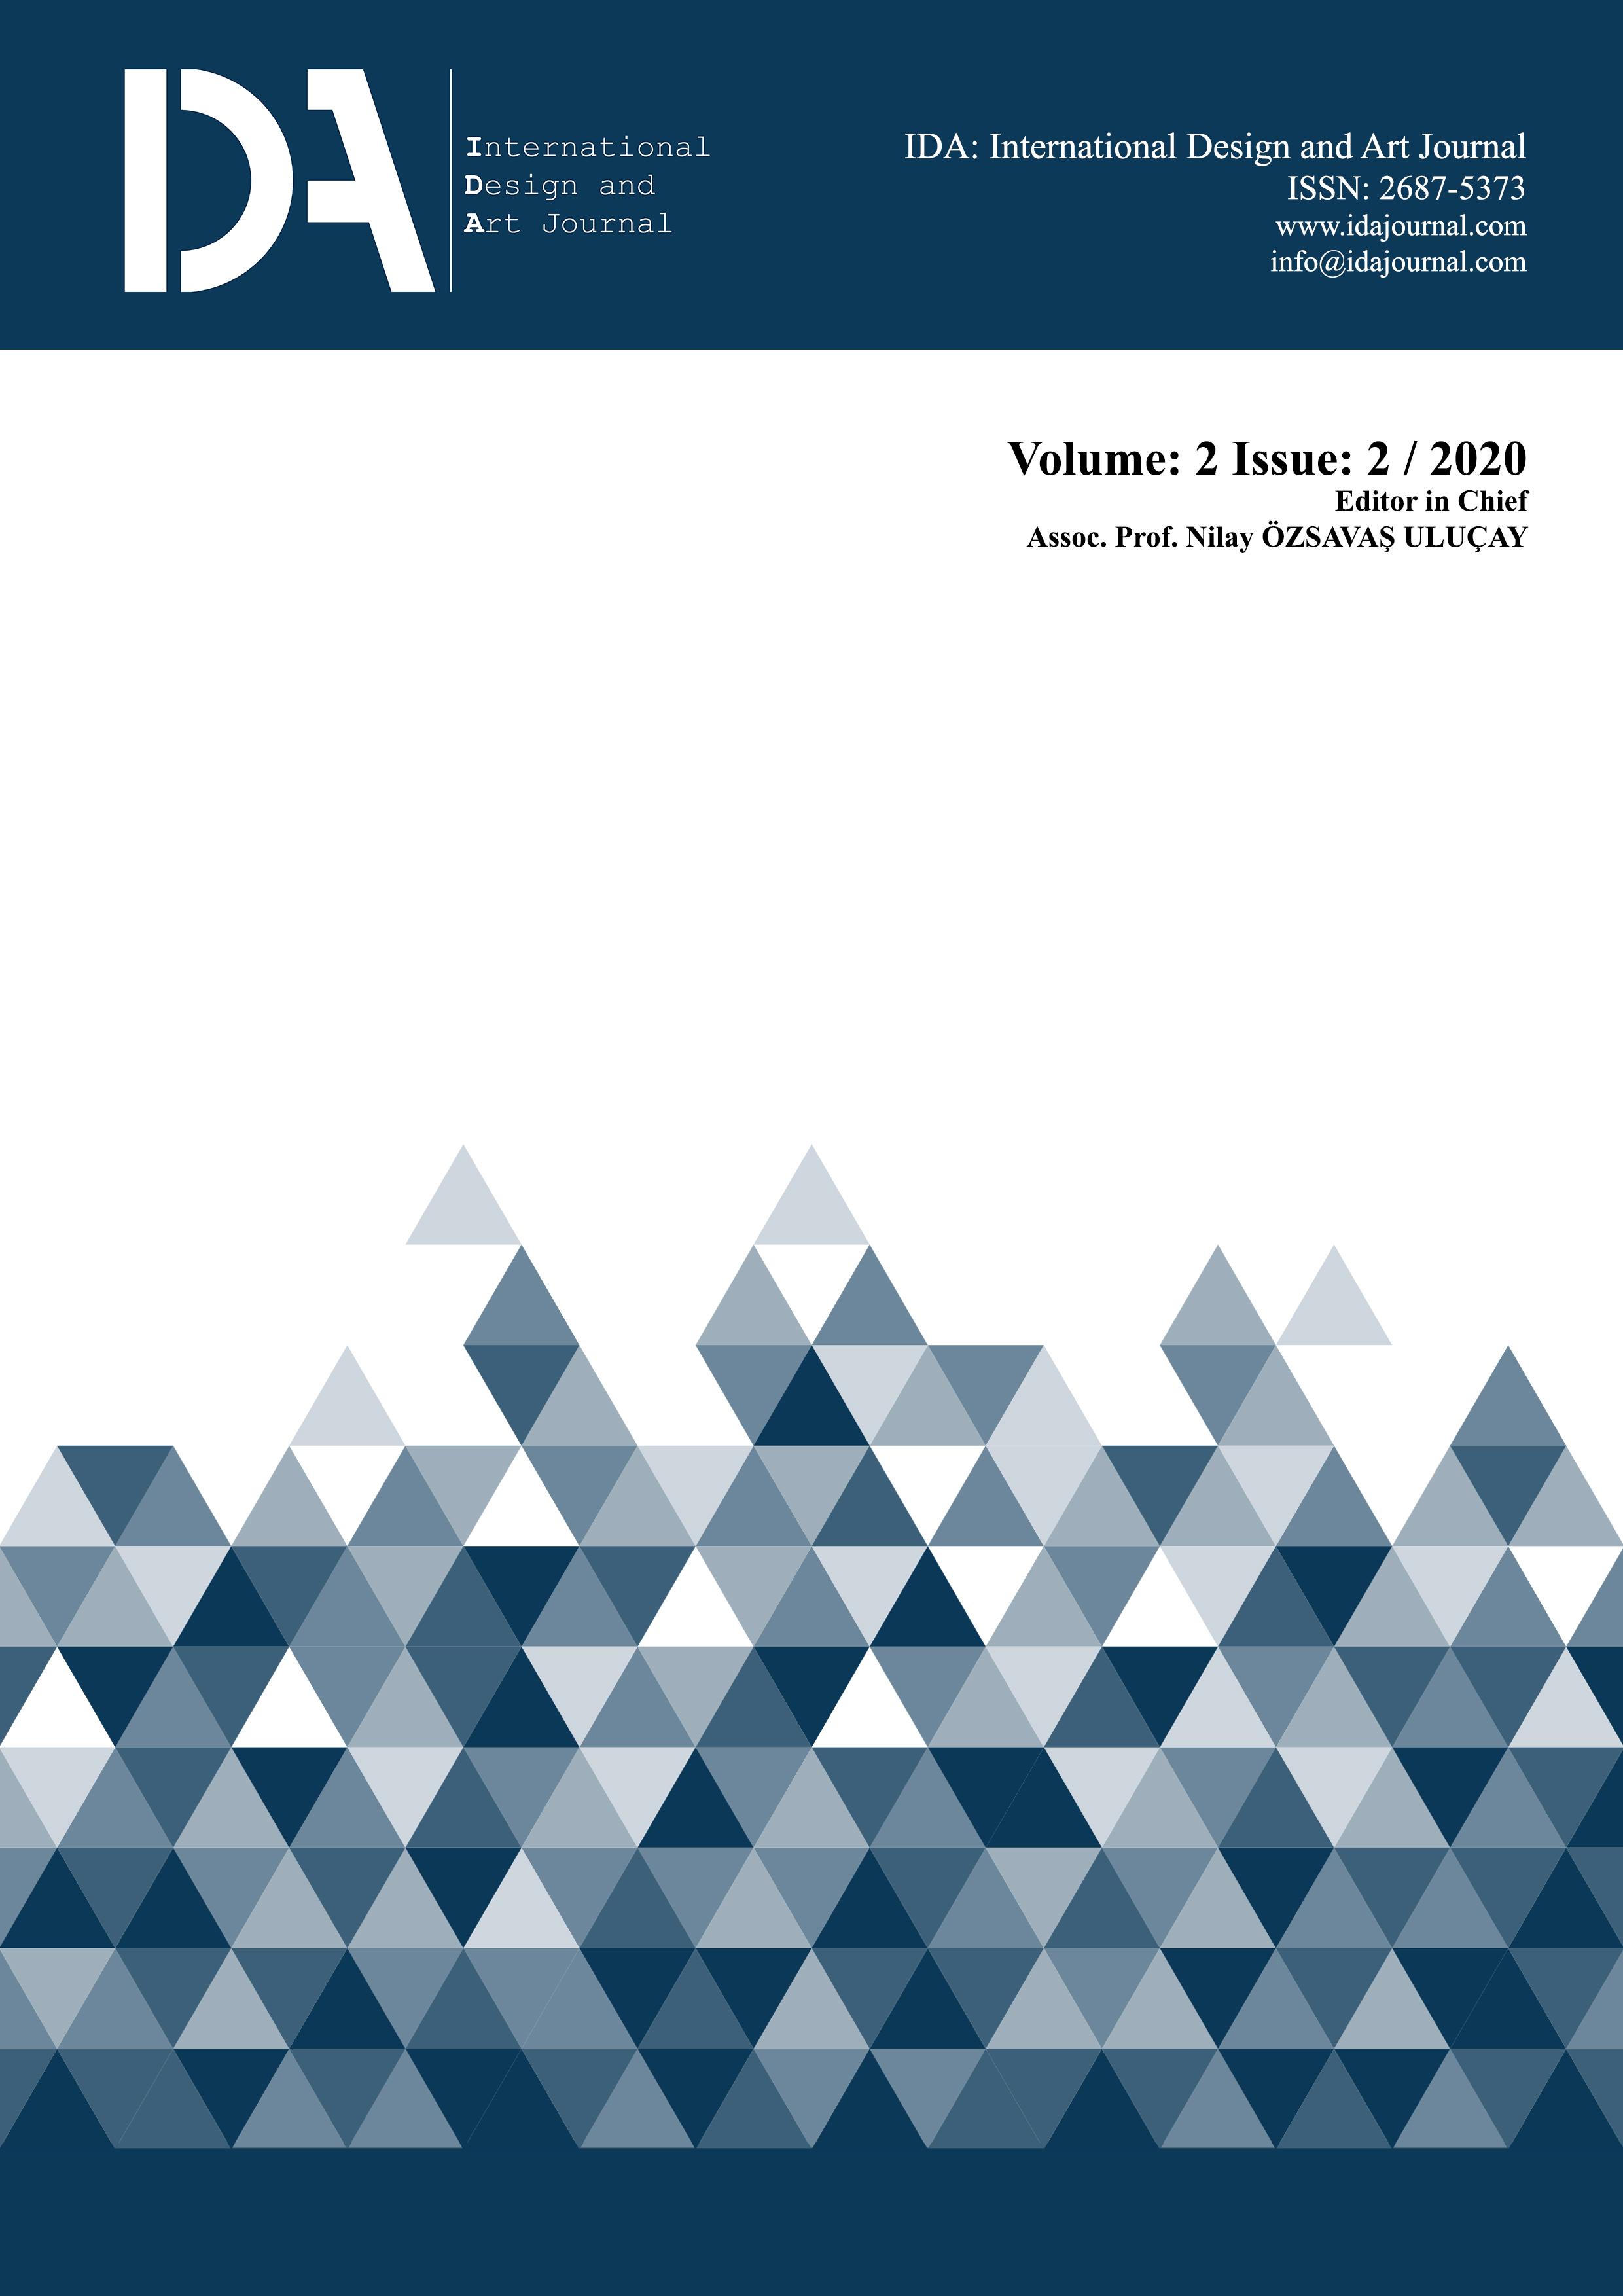 View Vol. 2 No. 2 (2020): IDA: International Design and Art Journal